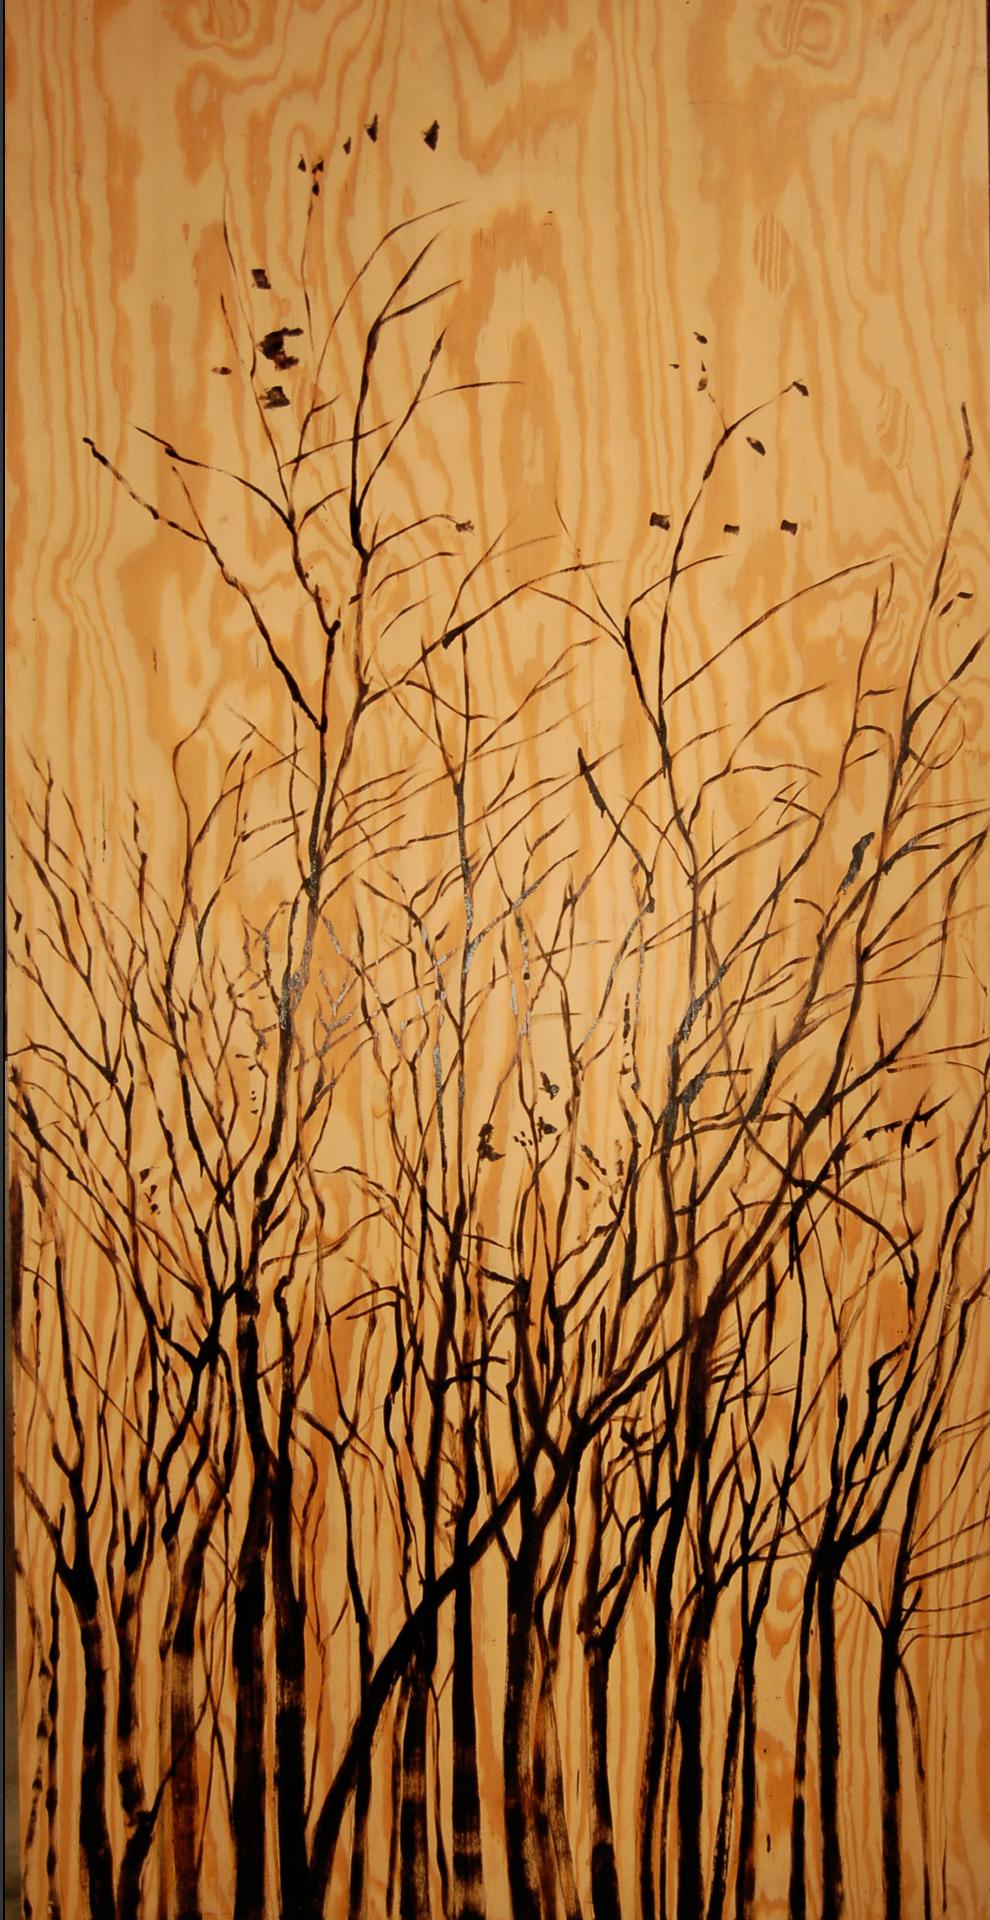 Trees in Season: Alder Brake